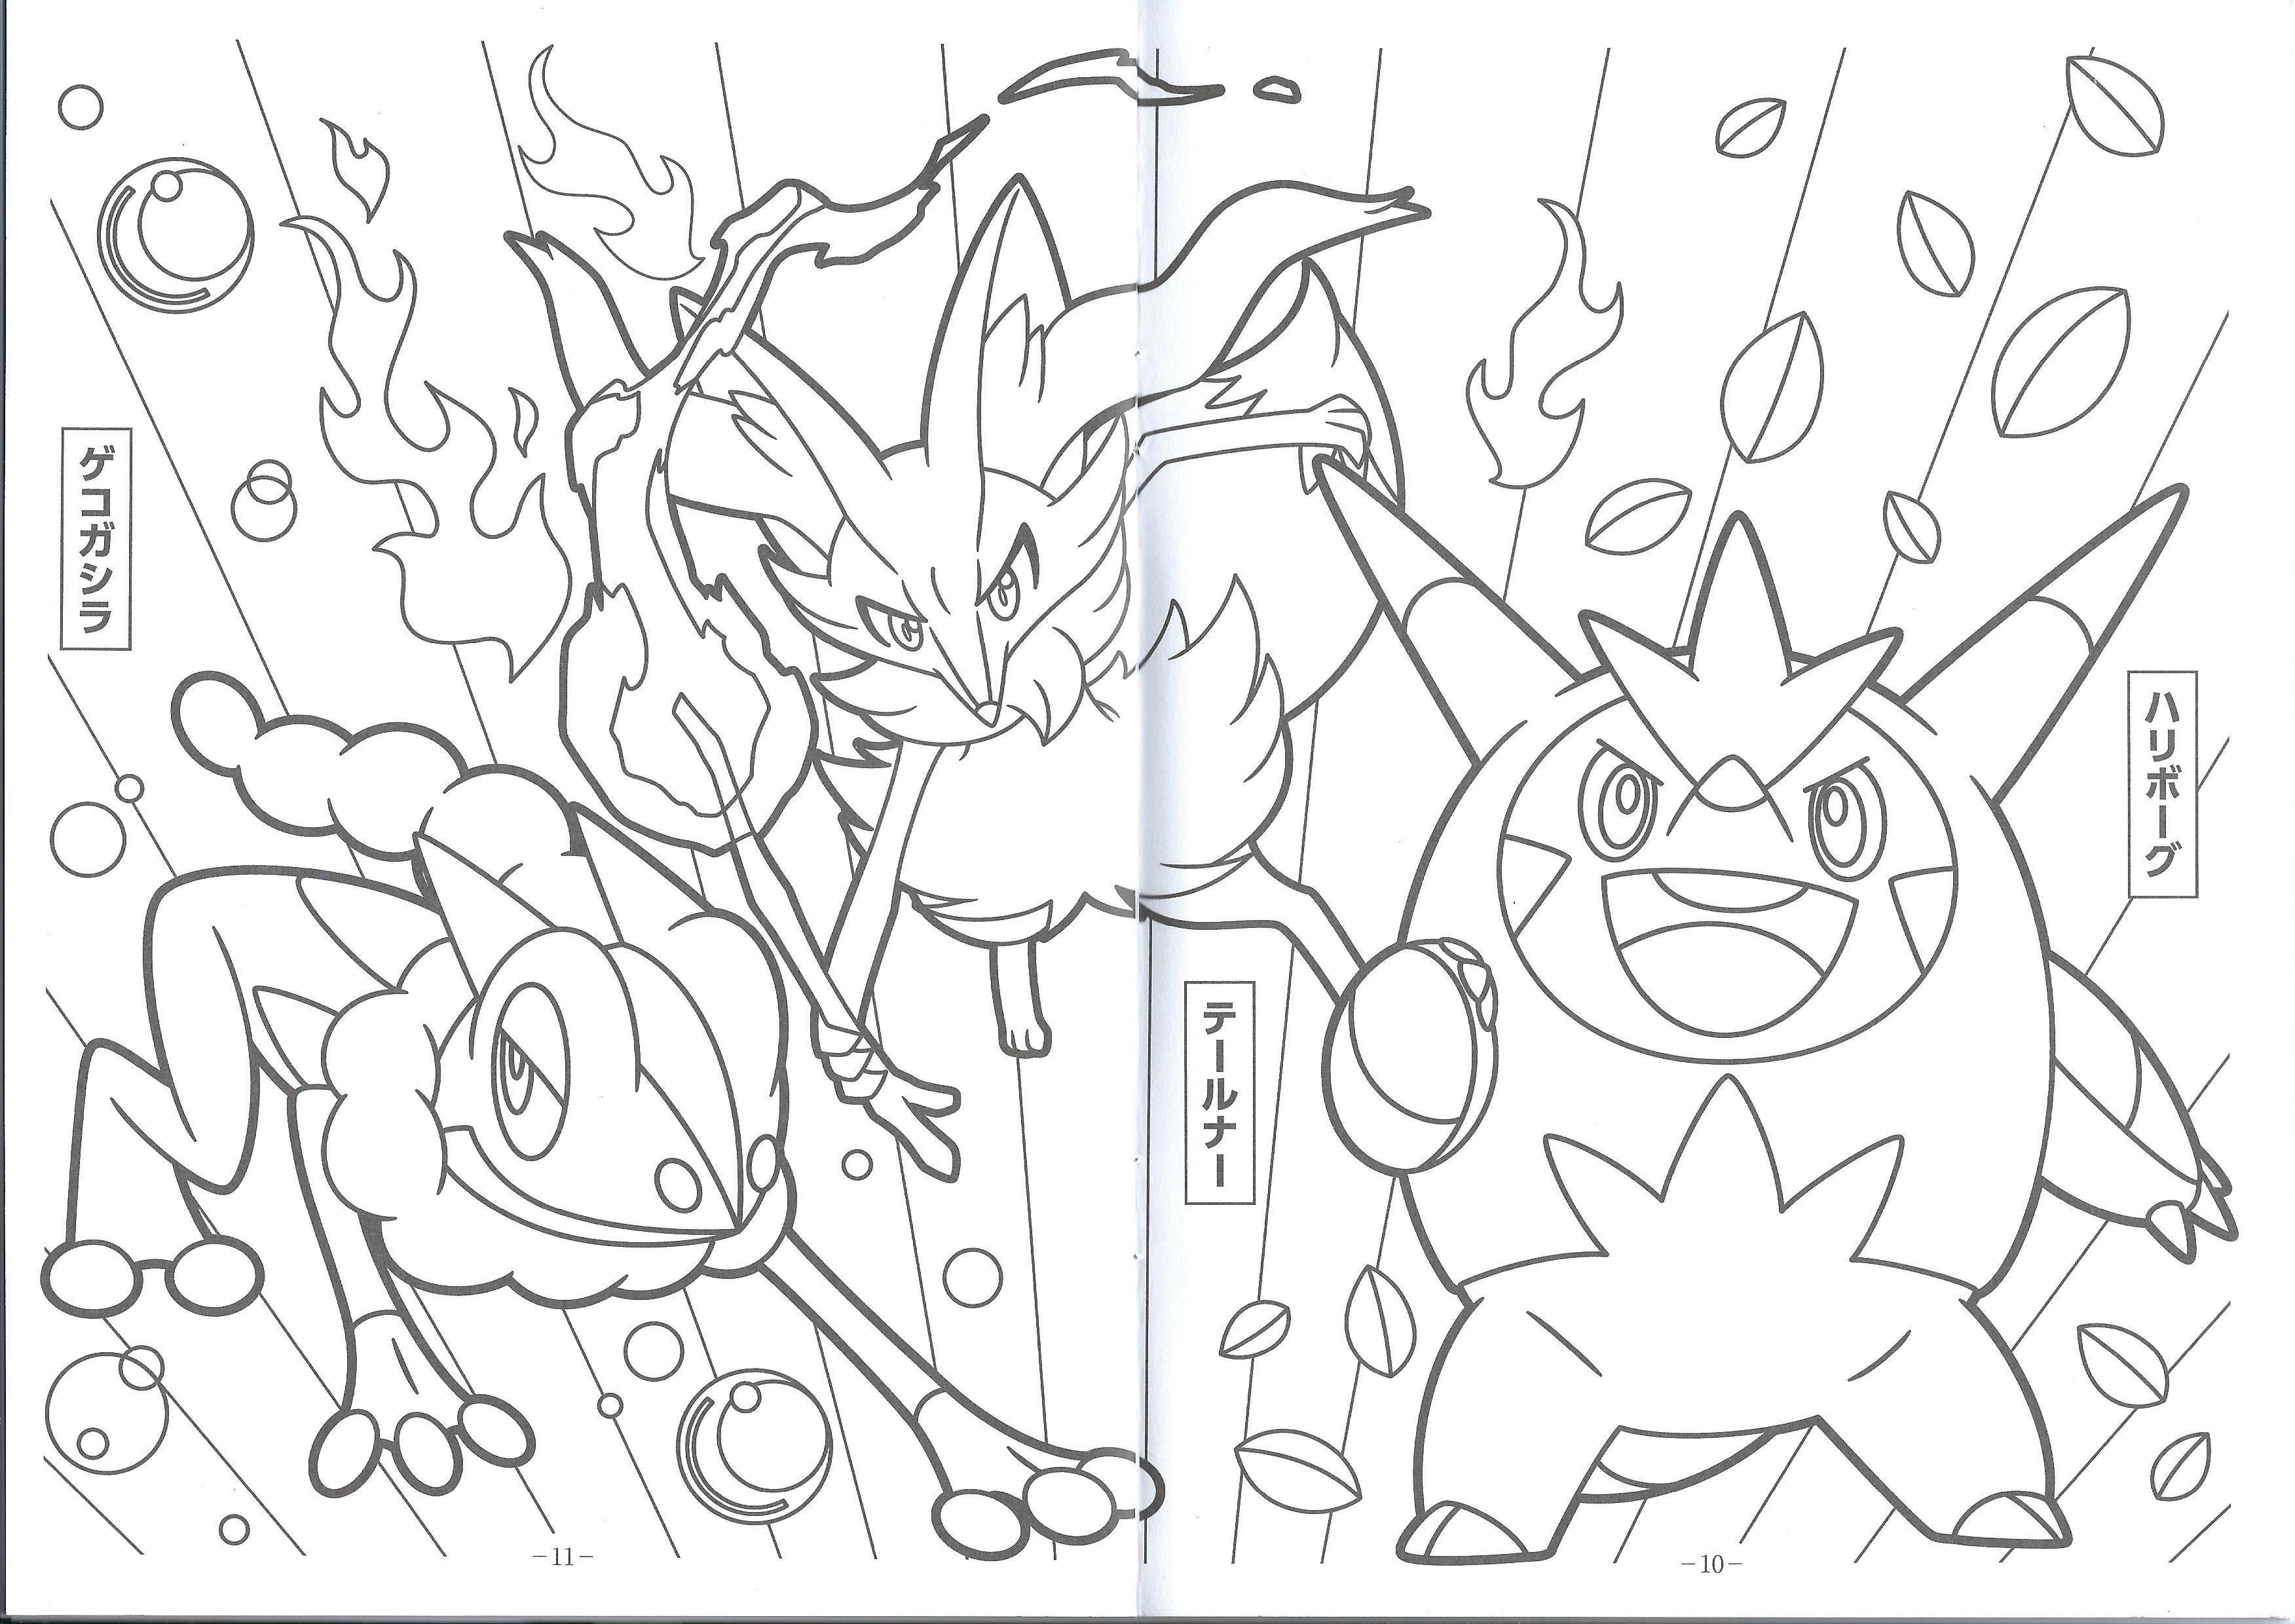 Pin De Austina Nee Em New Pokemon Xy Coloring Pages Pokemon Para Colorir Pokemon Colorir